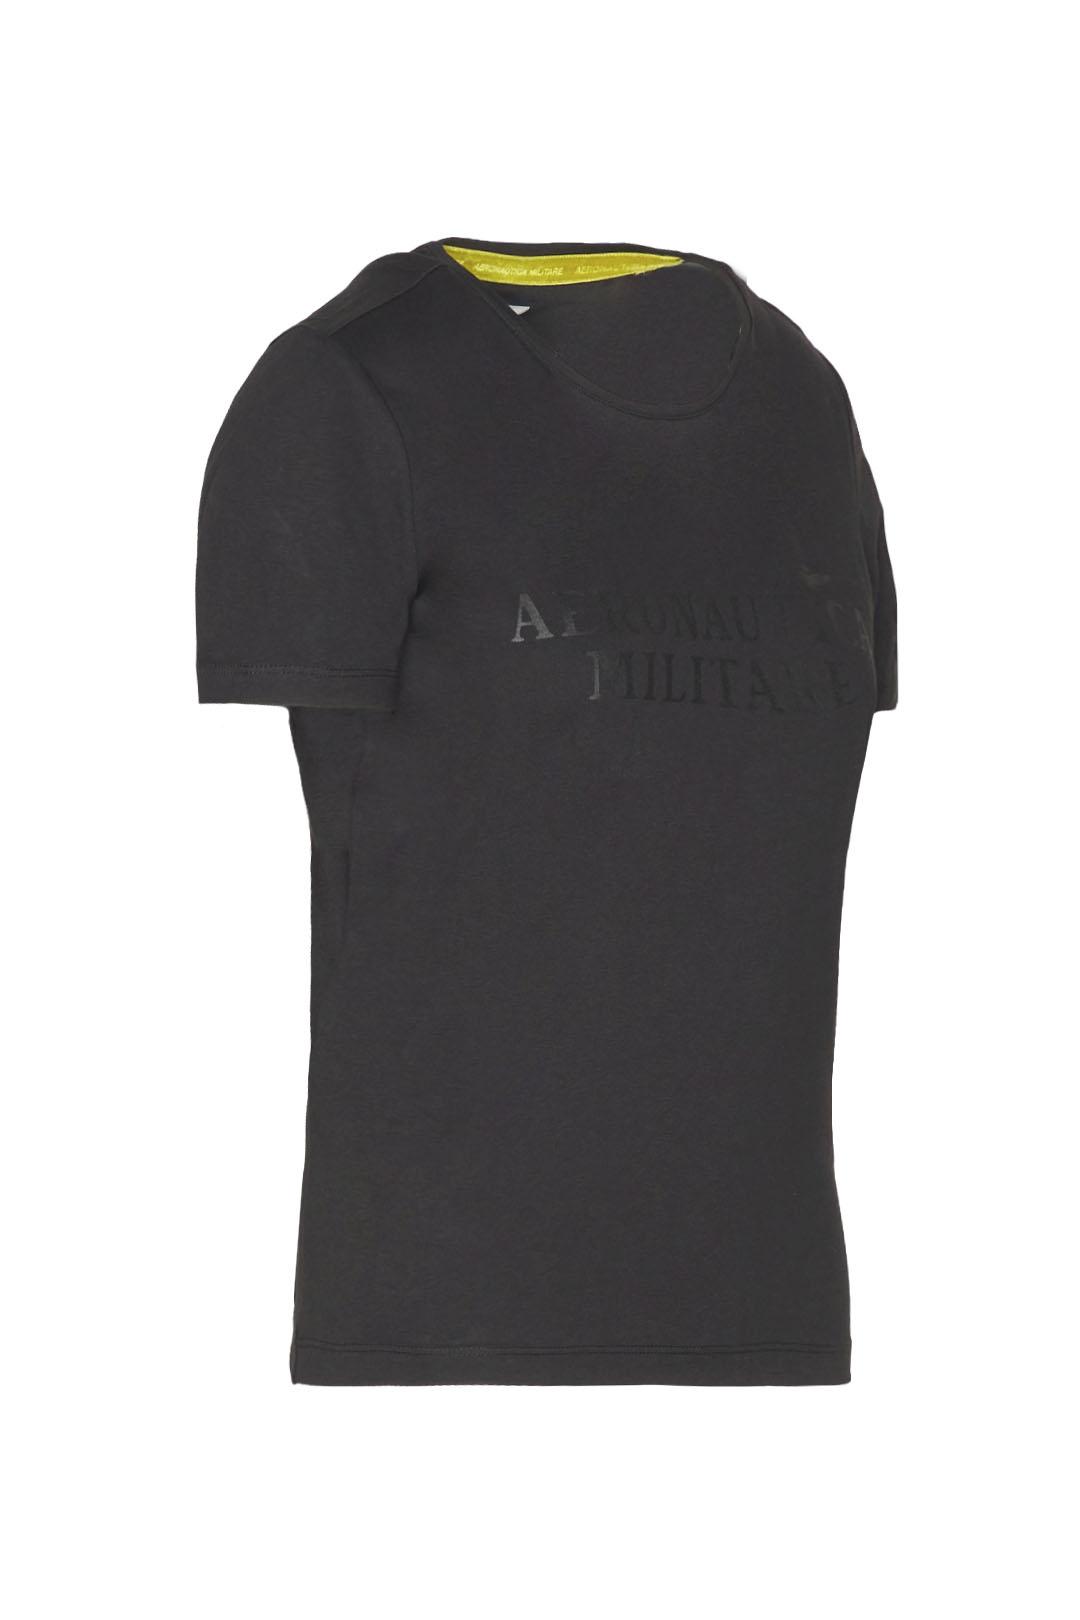 T-shirt girocollo in cotone stretch      2